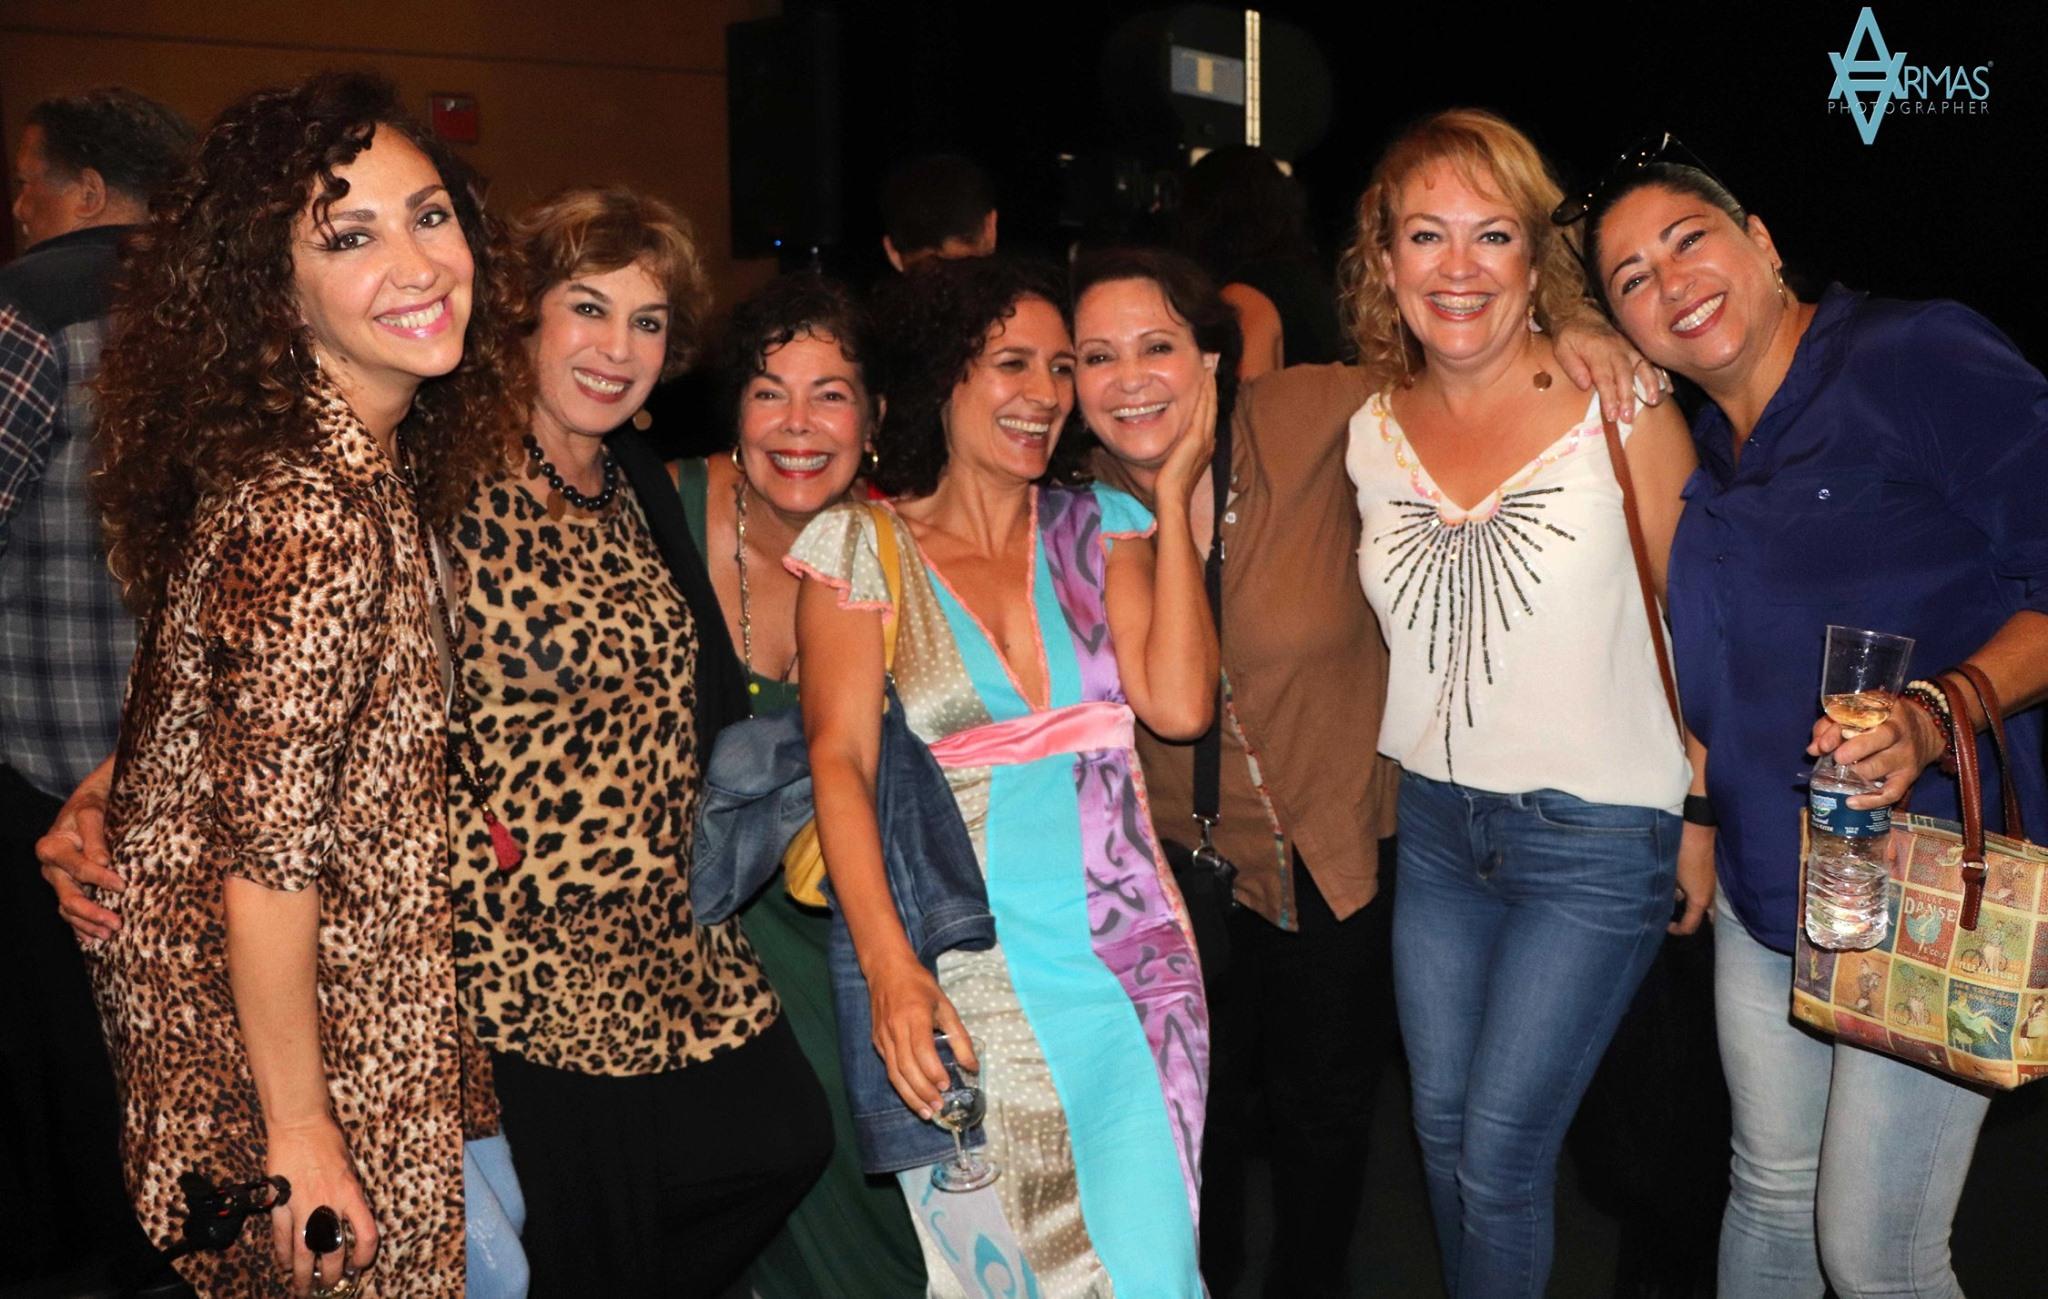 Sabrina, Adriana, Paulina y otras.jpg